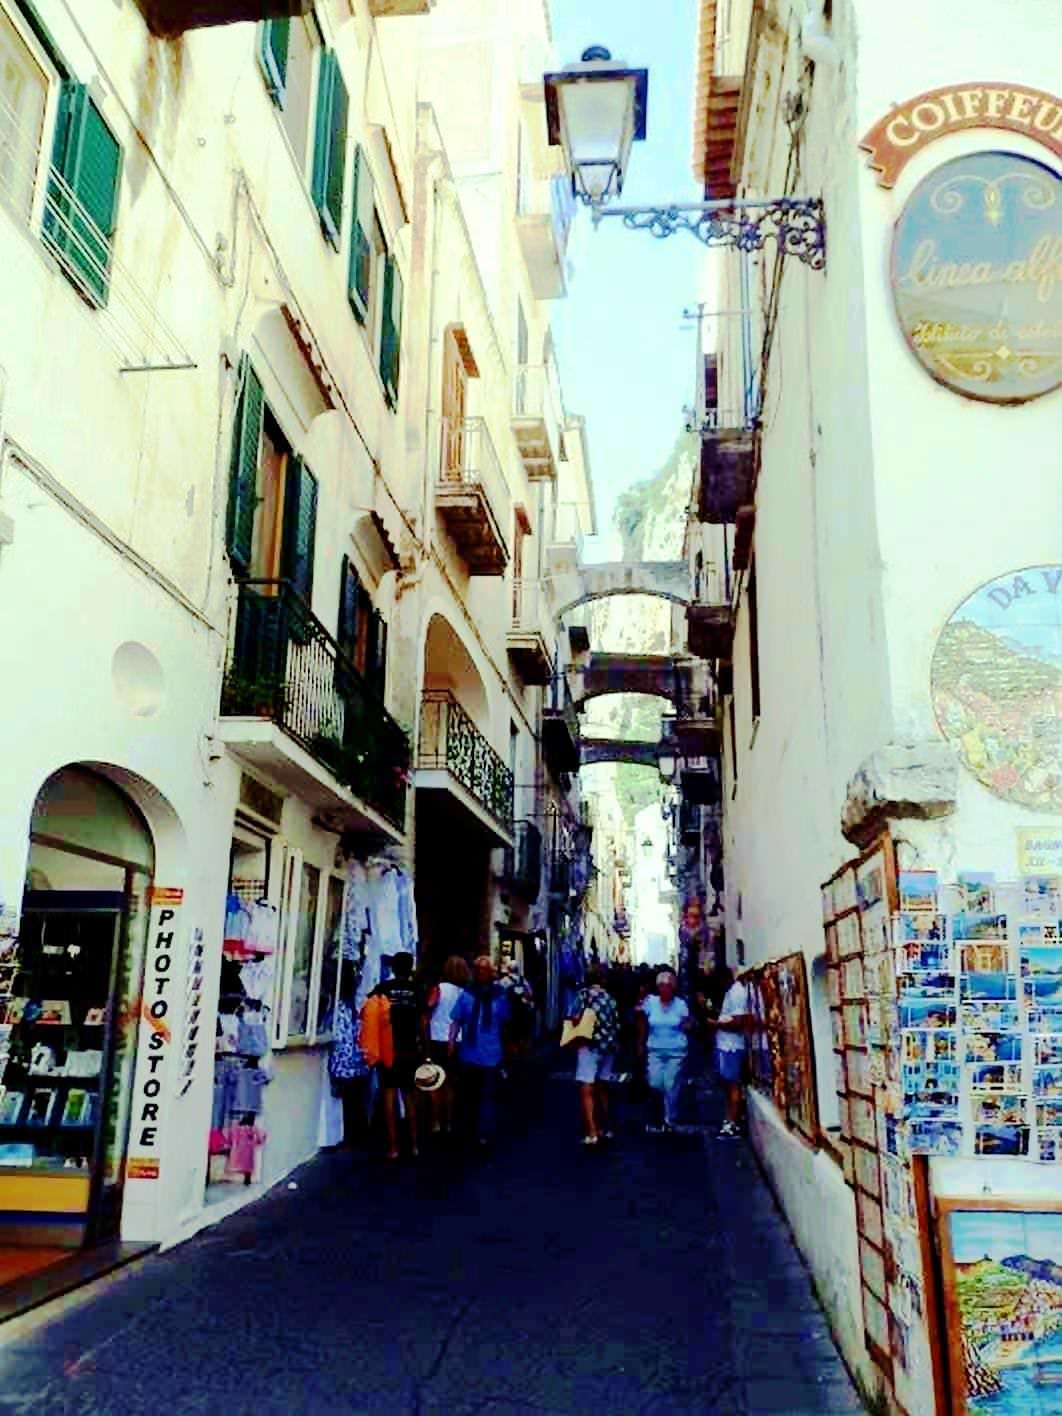 Amalfi, seducente e storica repubblica marinara 3 amalfi